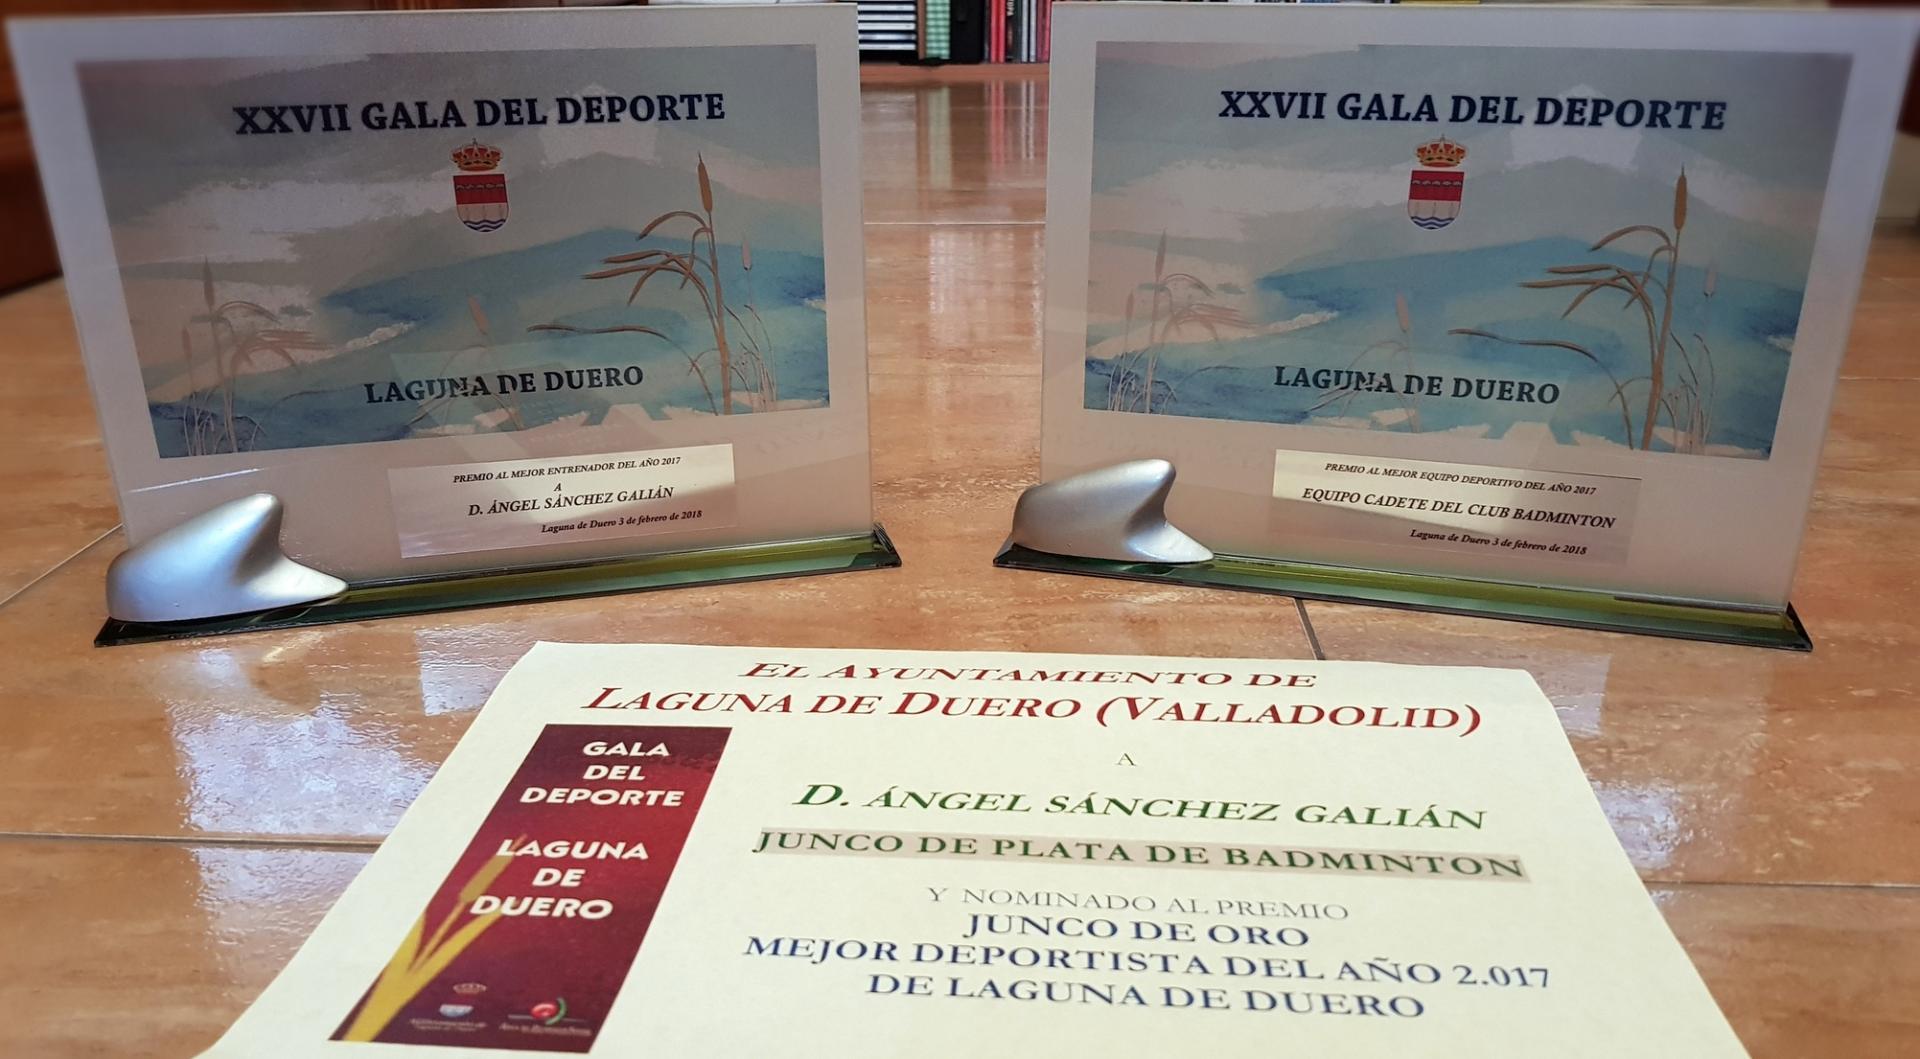 Premios gala del deporte 2017 iloveimg resized